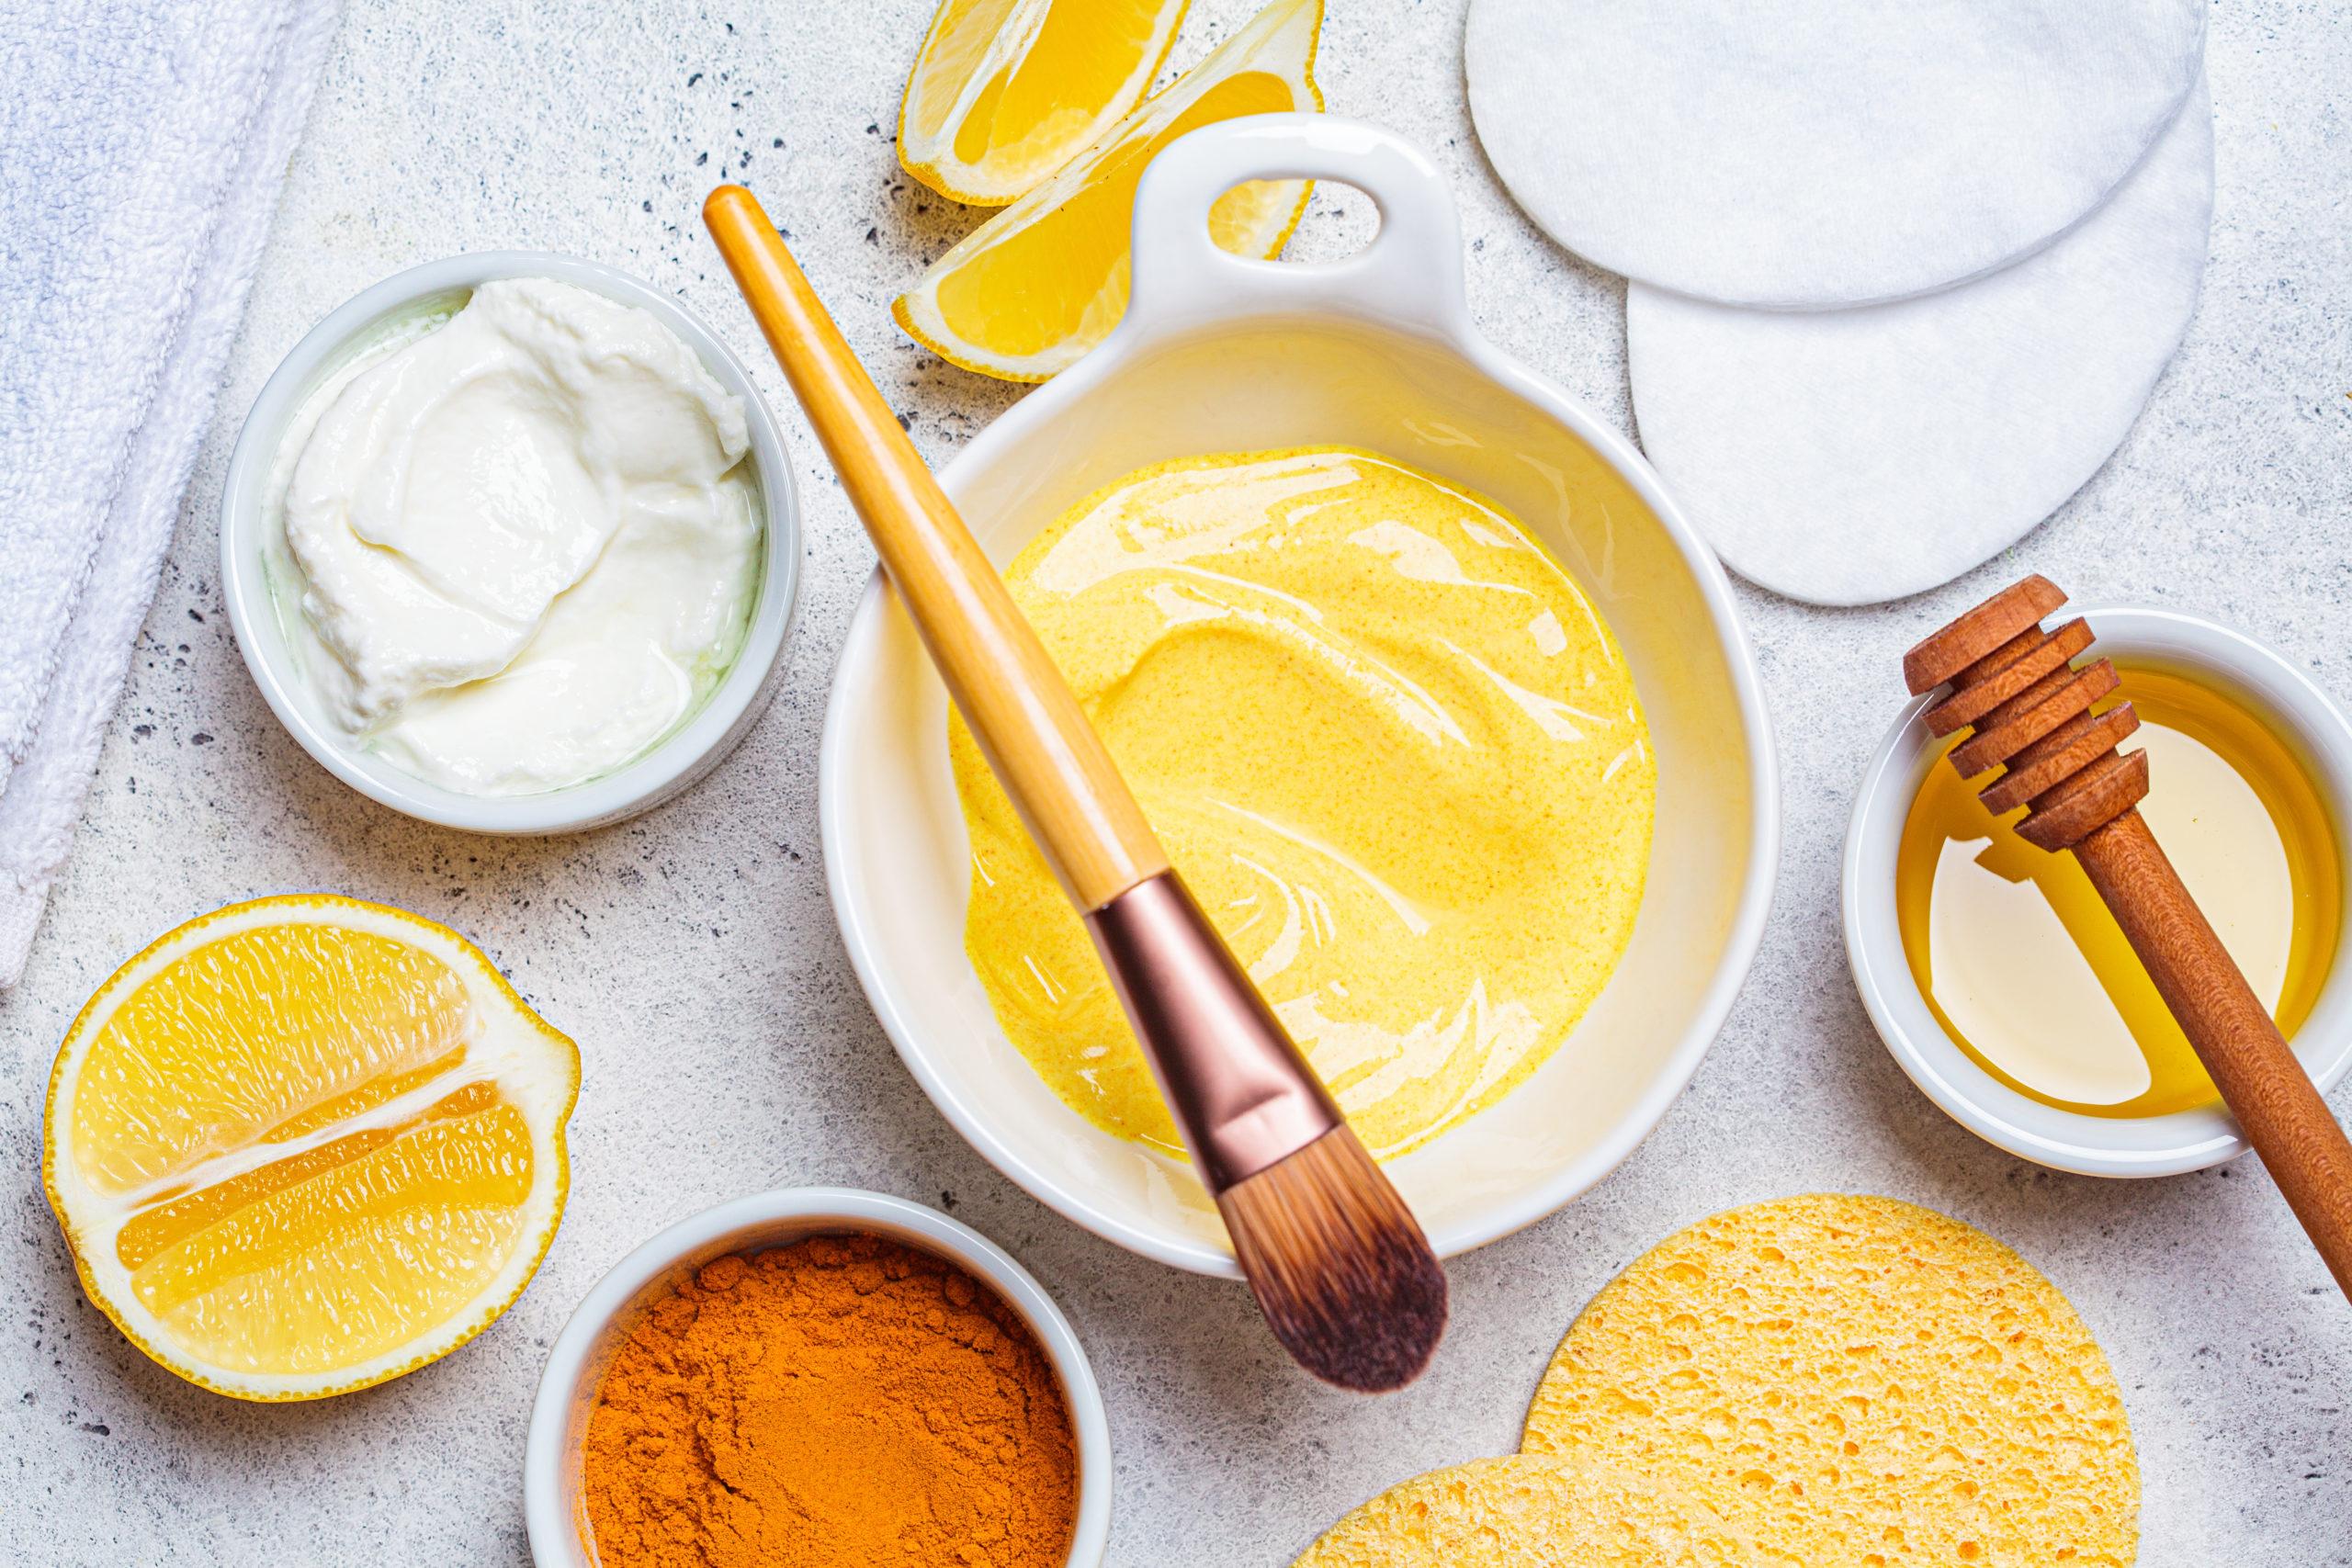 DIY Turmeric Yogurt Face Mask with Essential Oils